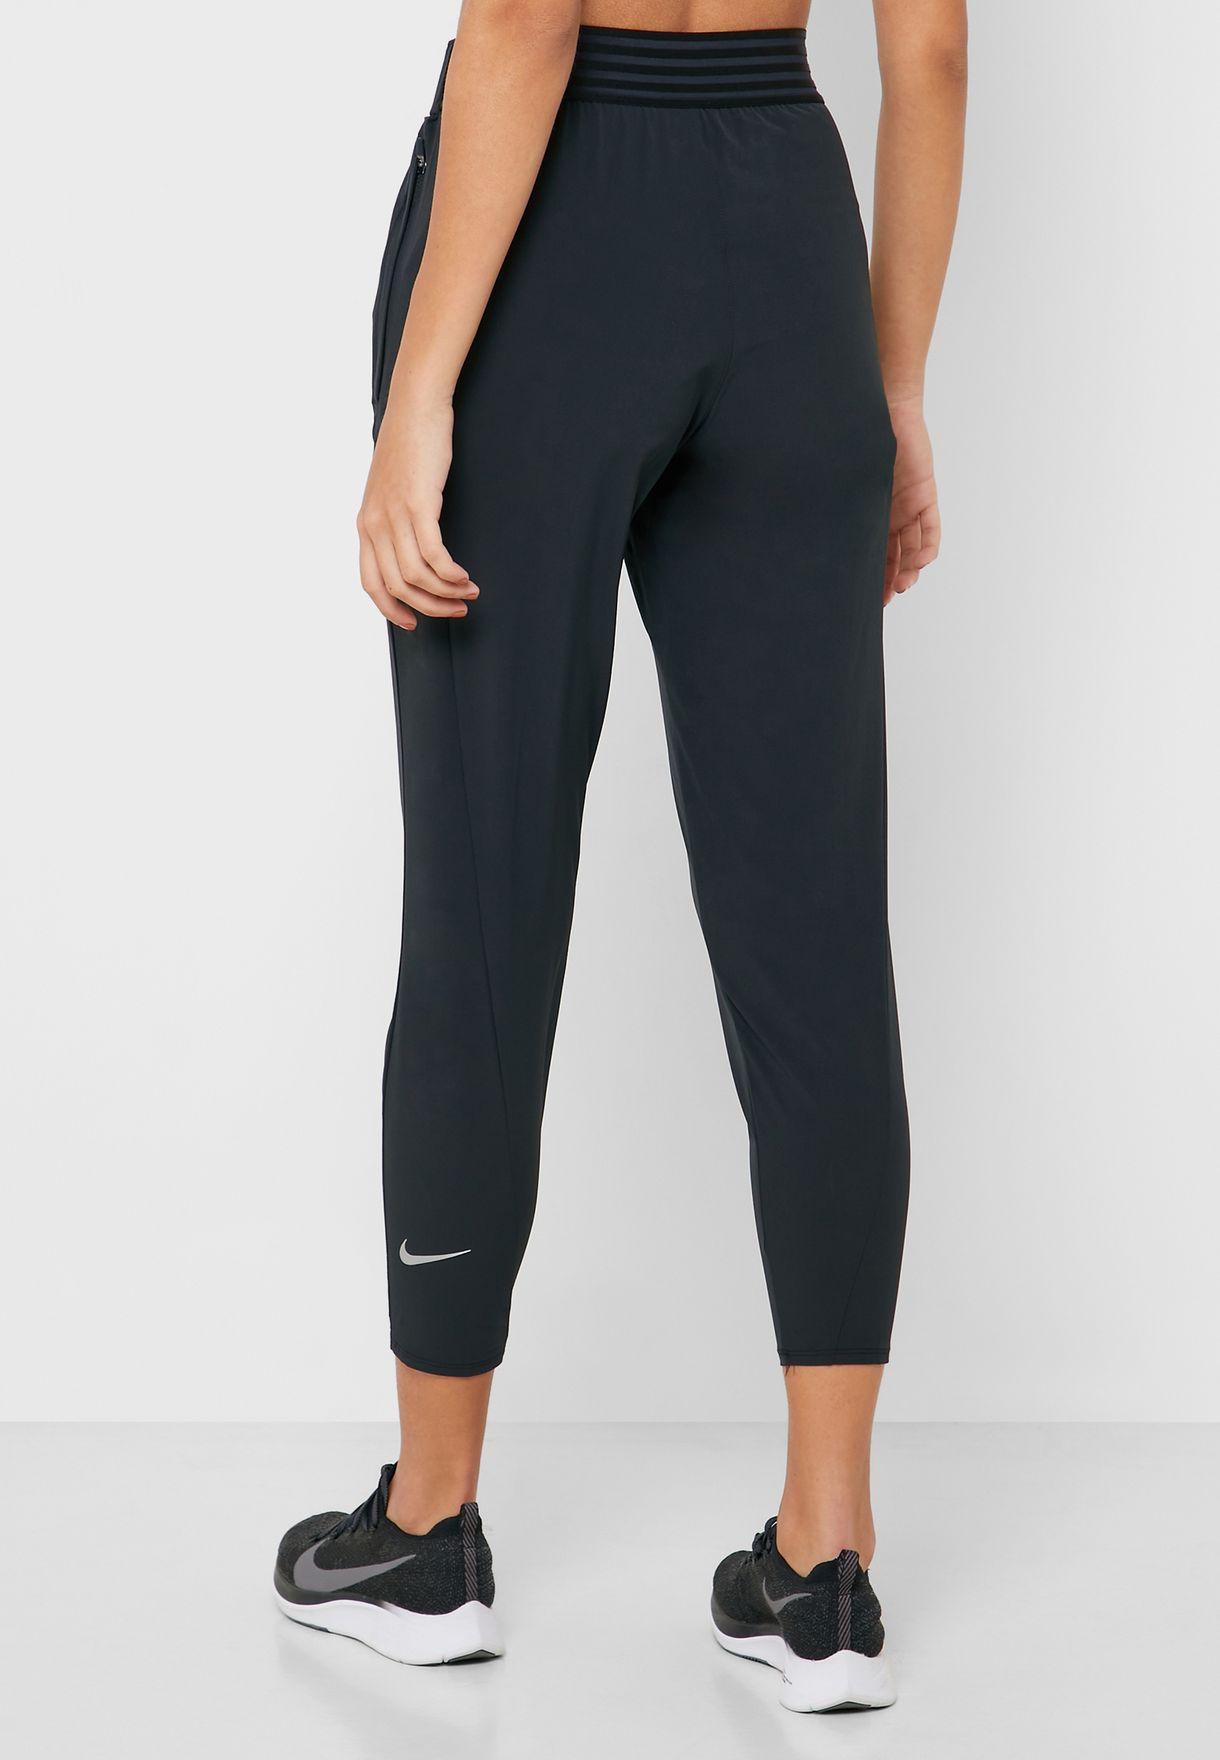 nacido Mejora diagonal  Buy Nike black Essential 7/8 Tights for Women in MENA, Worldwide    BV2898-011